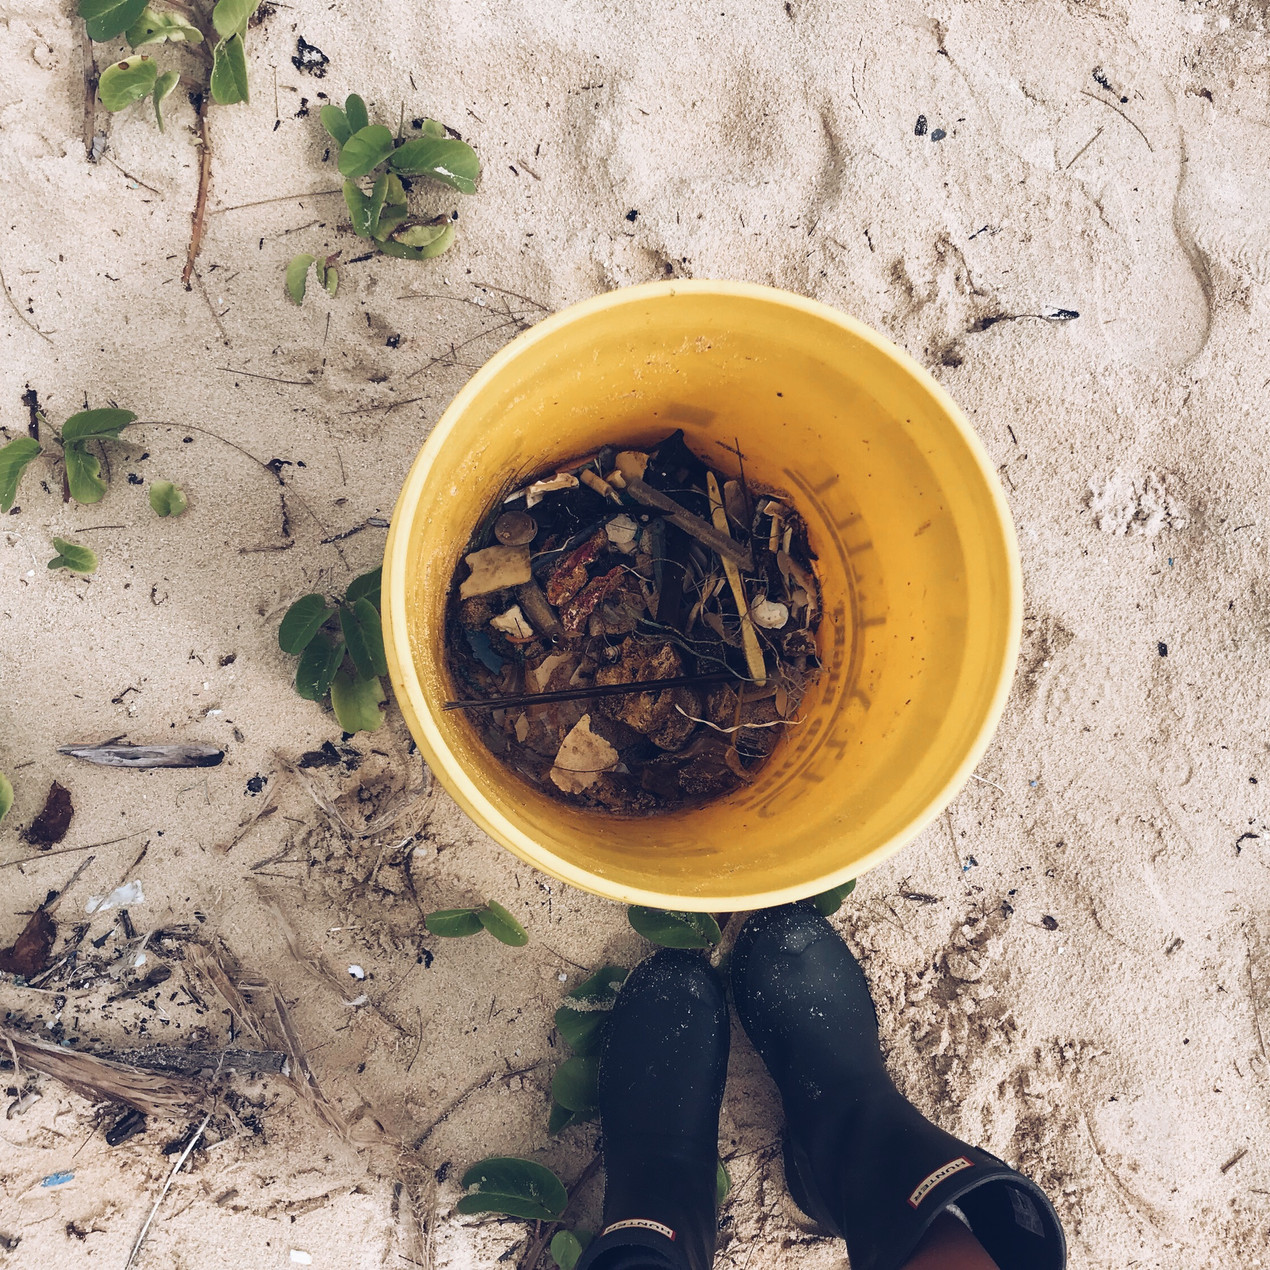 Siena Schaar waimanalo keiko conservation one ocean conservation water inspired microplastics #nerdsagainstnurdles clean up oahu